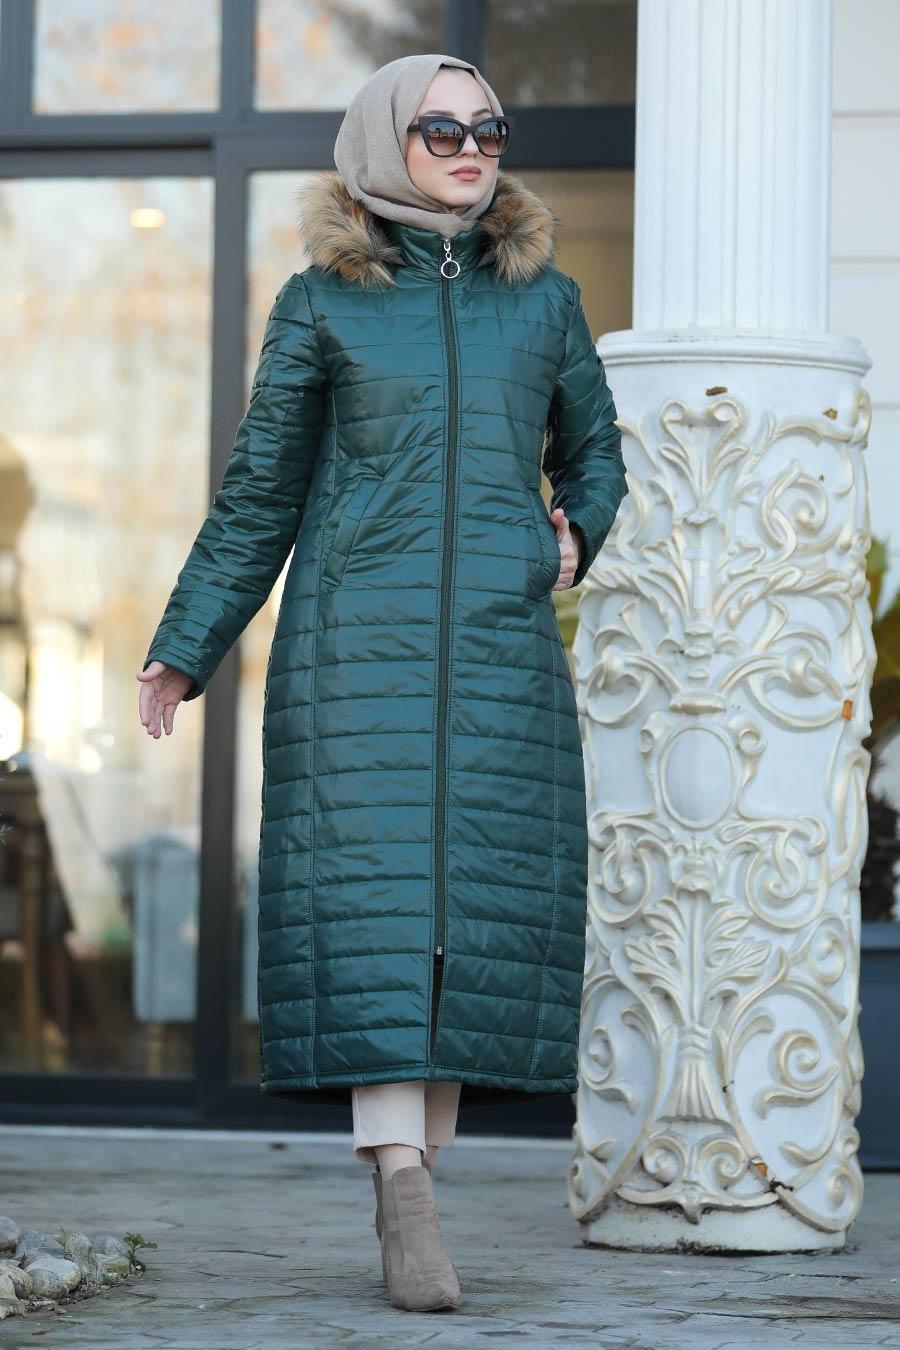 Neva Style - Green İnflatable Coat 10650Y